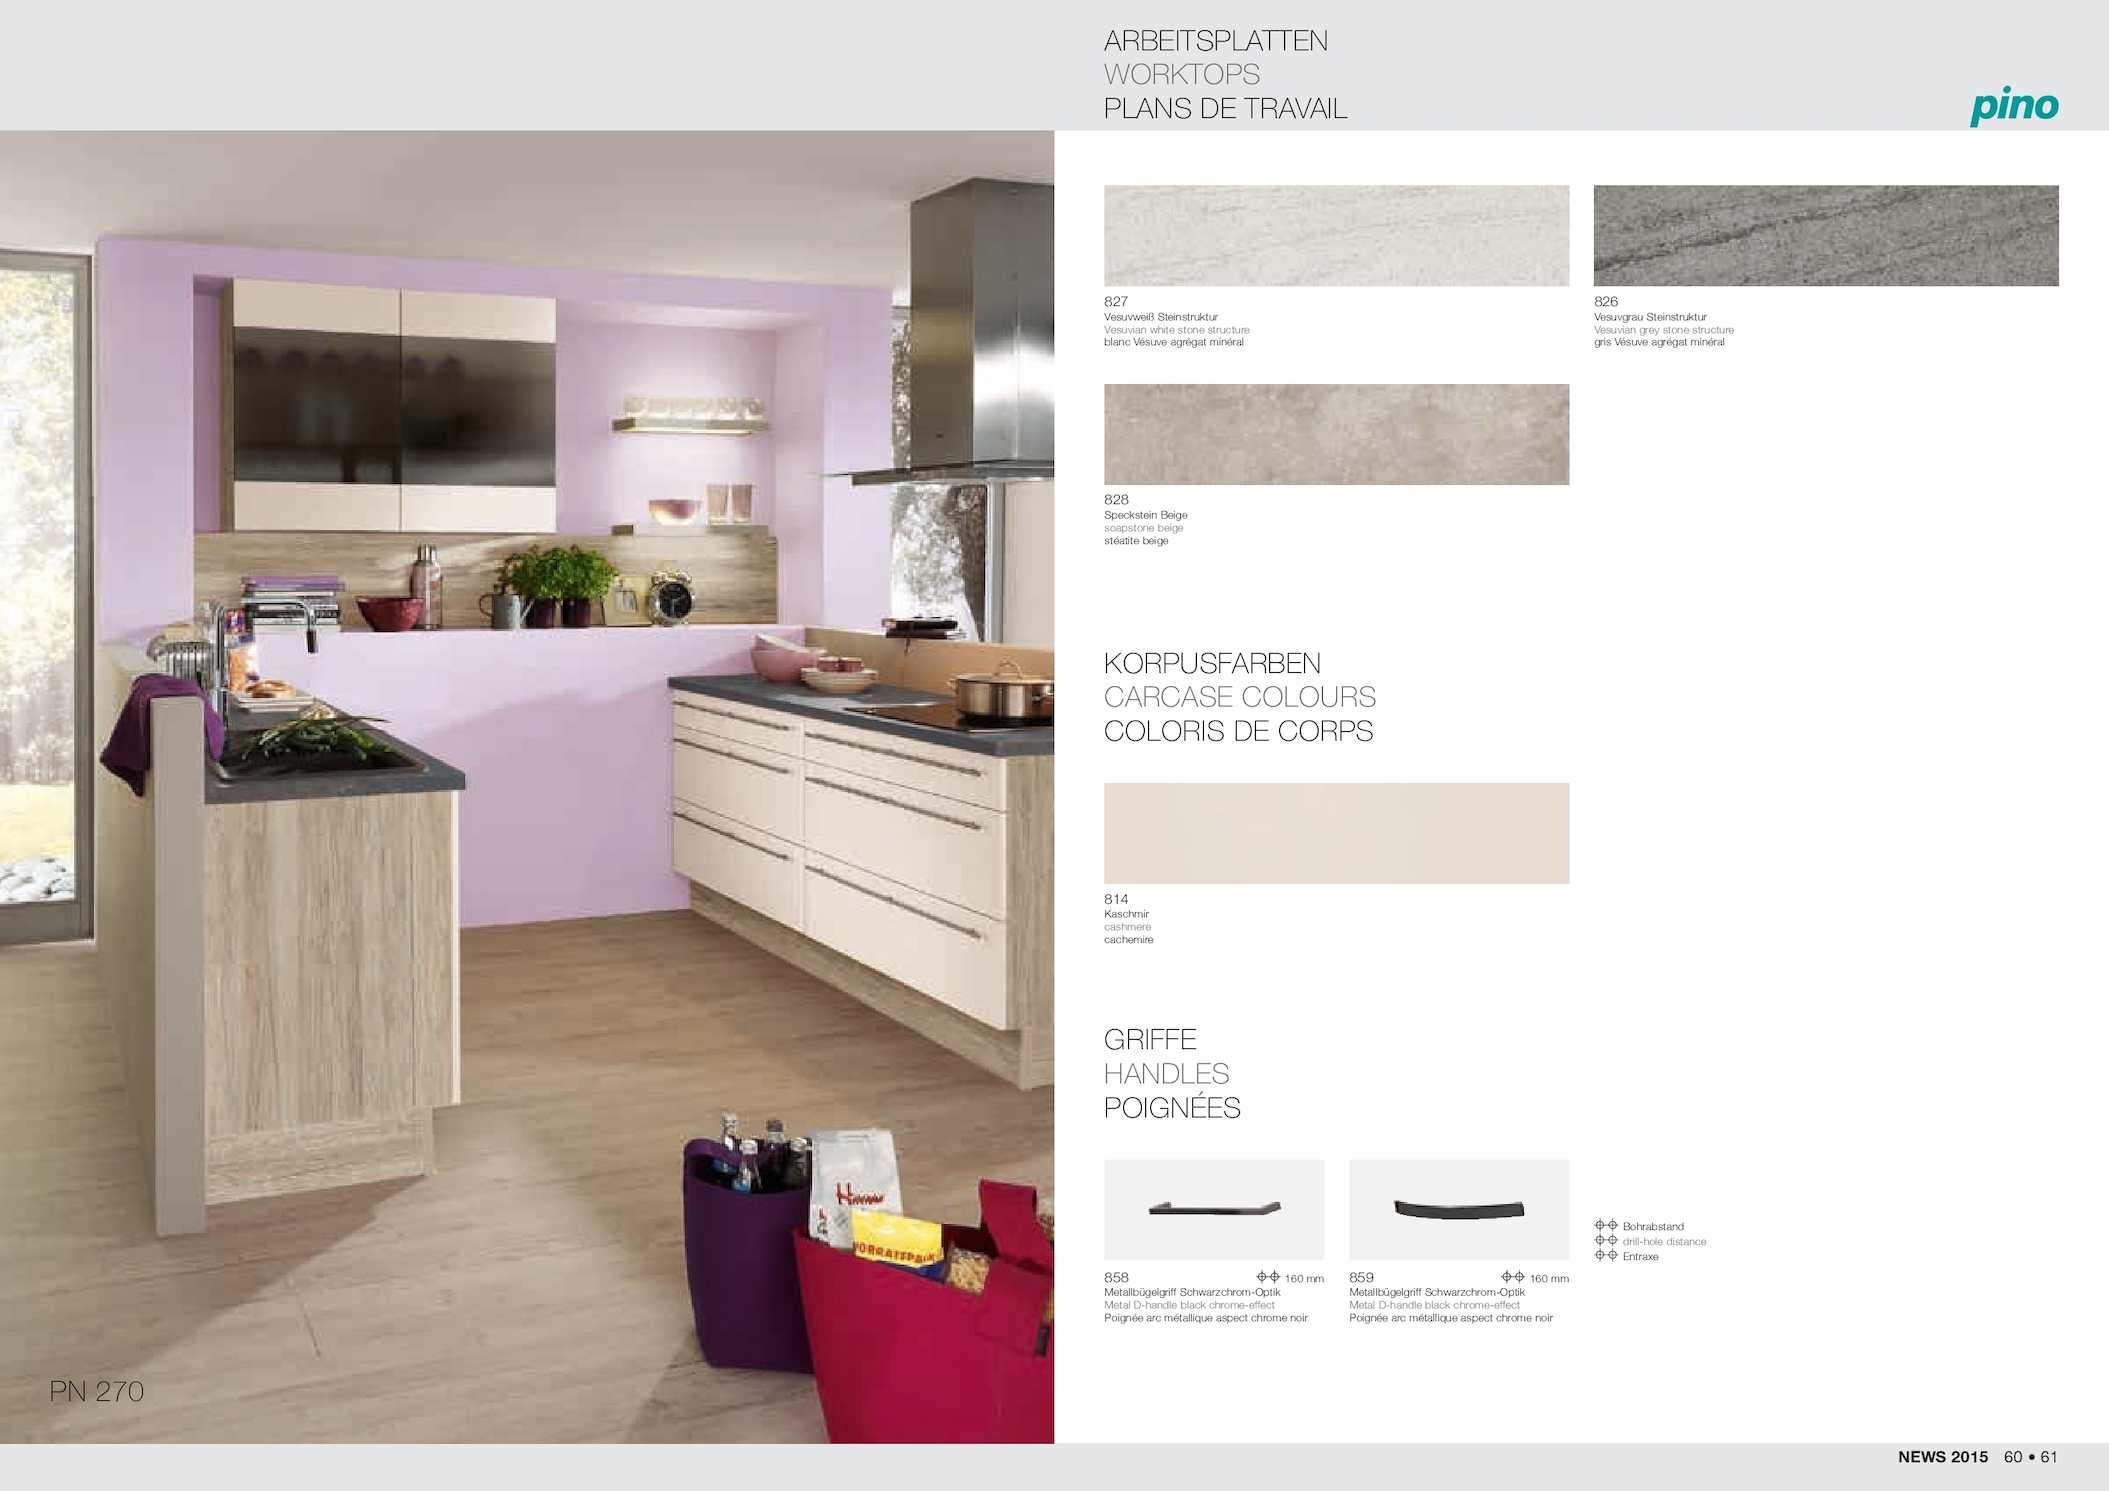 Steatite Plan De Travail pino cuisines - calameo downloader